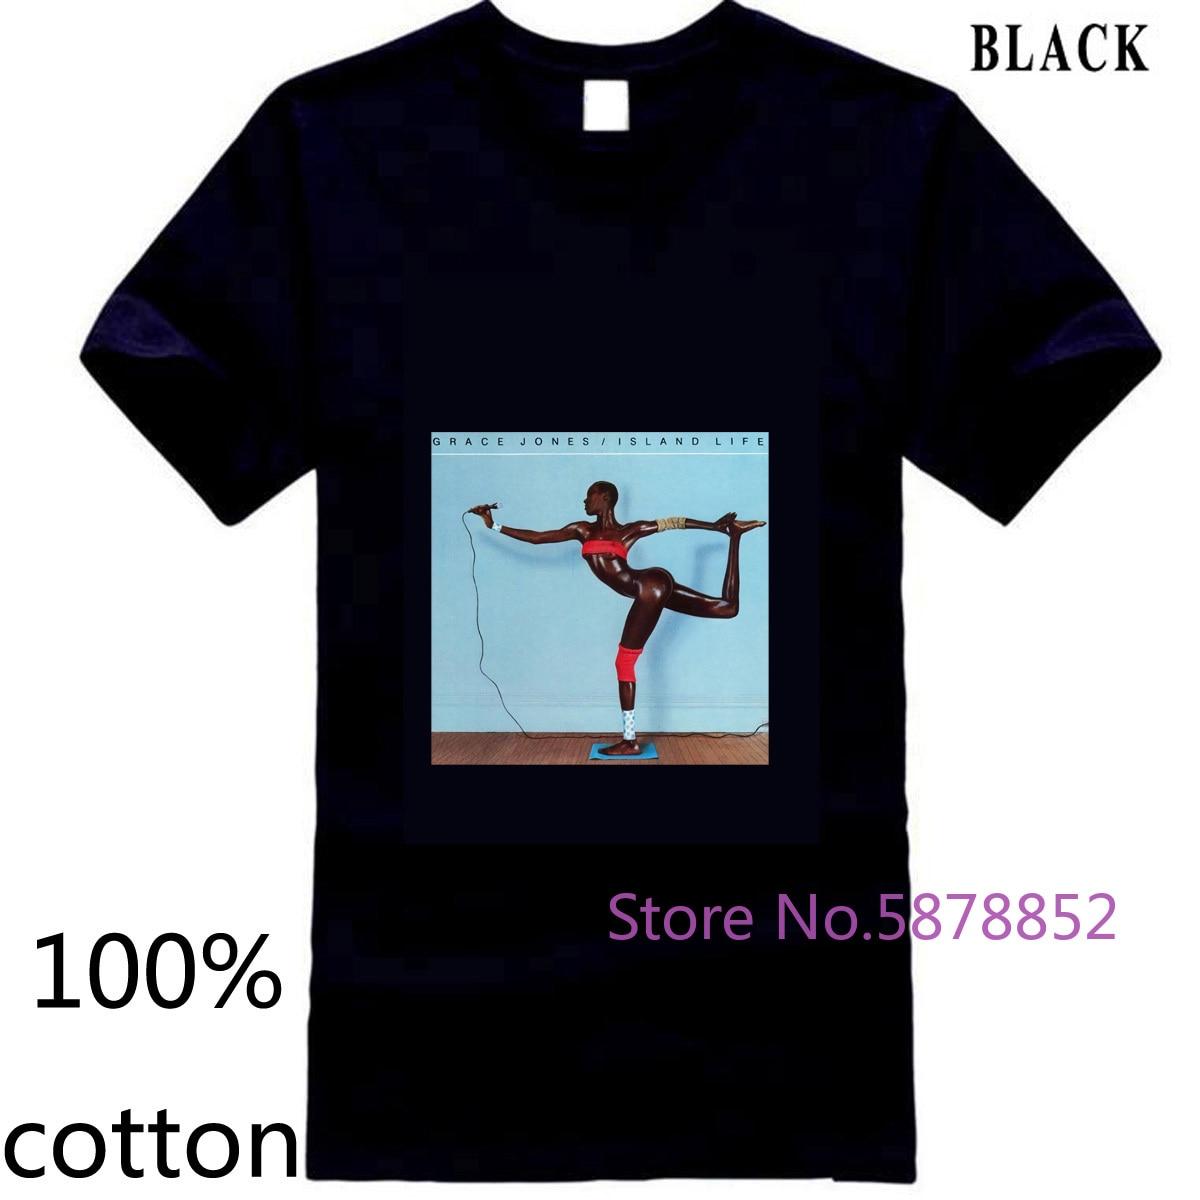 Grace Jones Island Life Rock banda de música Unisex GJ3 recién llegado, camiseta para hombre, camiseta, camisetas, 100% de algodón